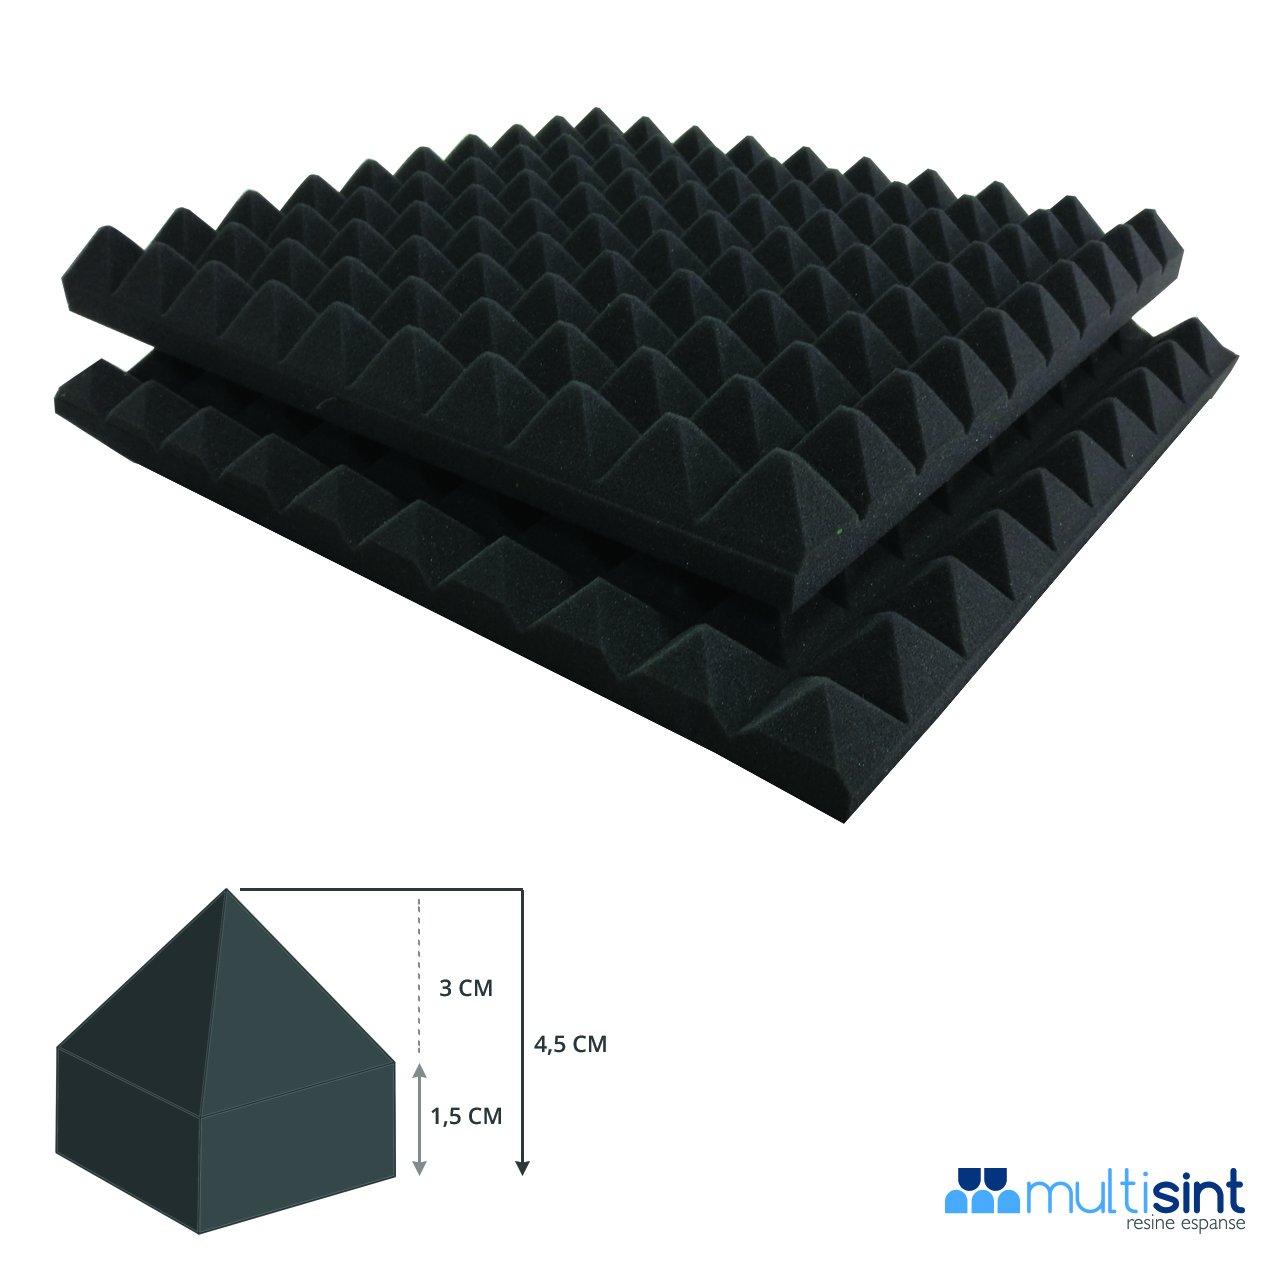 1,5+3 Multisint Confezione 2 Pannelli Pannelli Fonoassorbenti Piramidali Ignifughi Certificazione di Resistenza al Fuoco Classe 1IM Standard 50x50x4,5 cm Densit/à 30 Autoestinguente